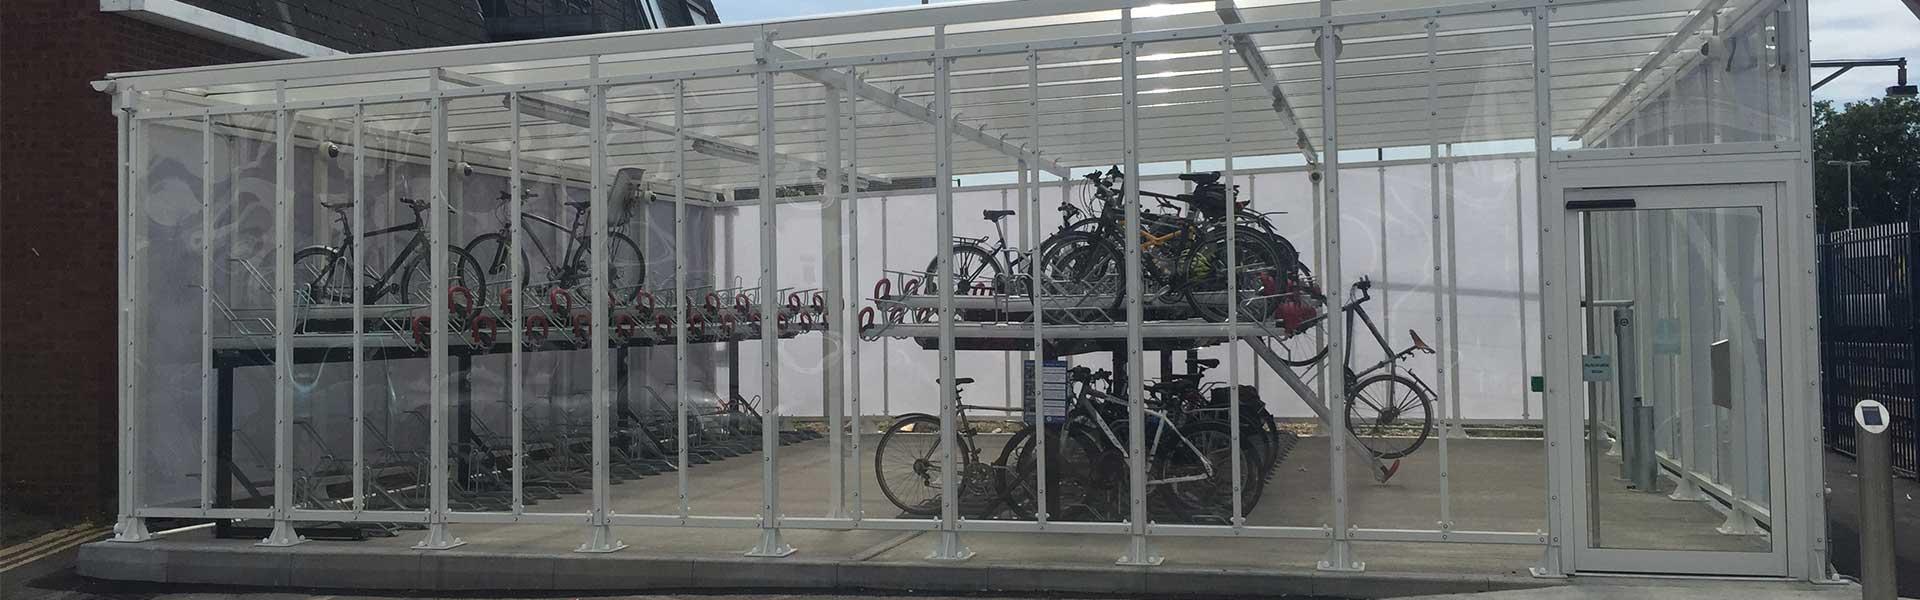 Horsham-cycle-hub-case-study